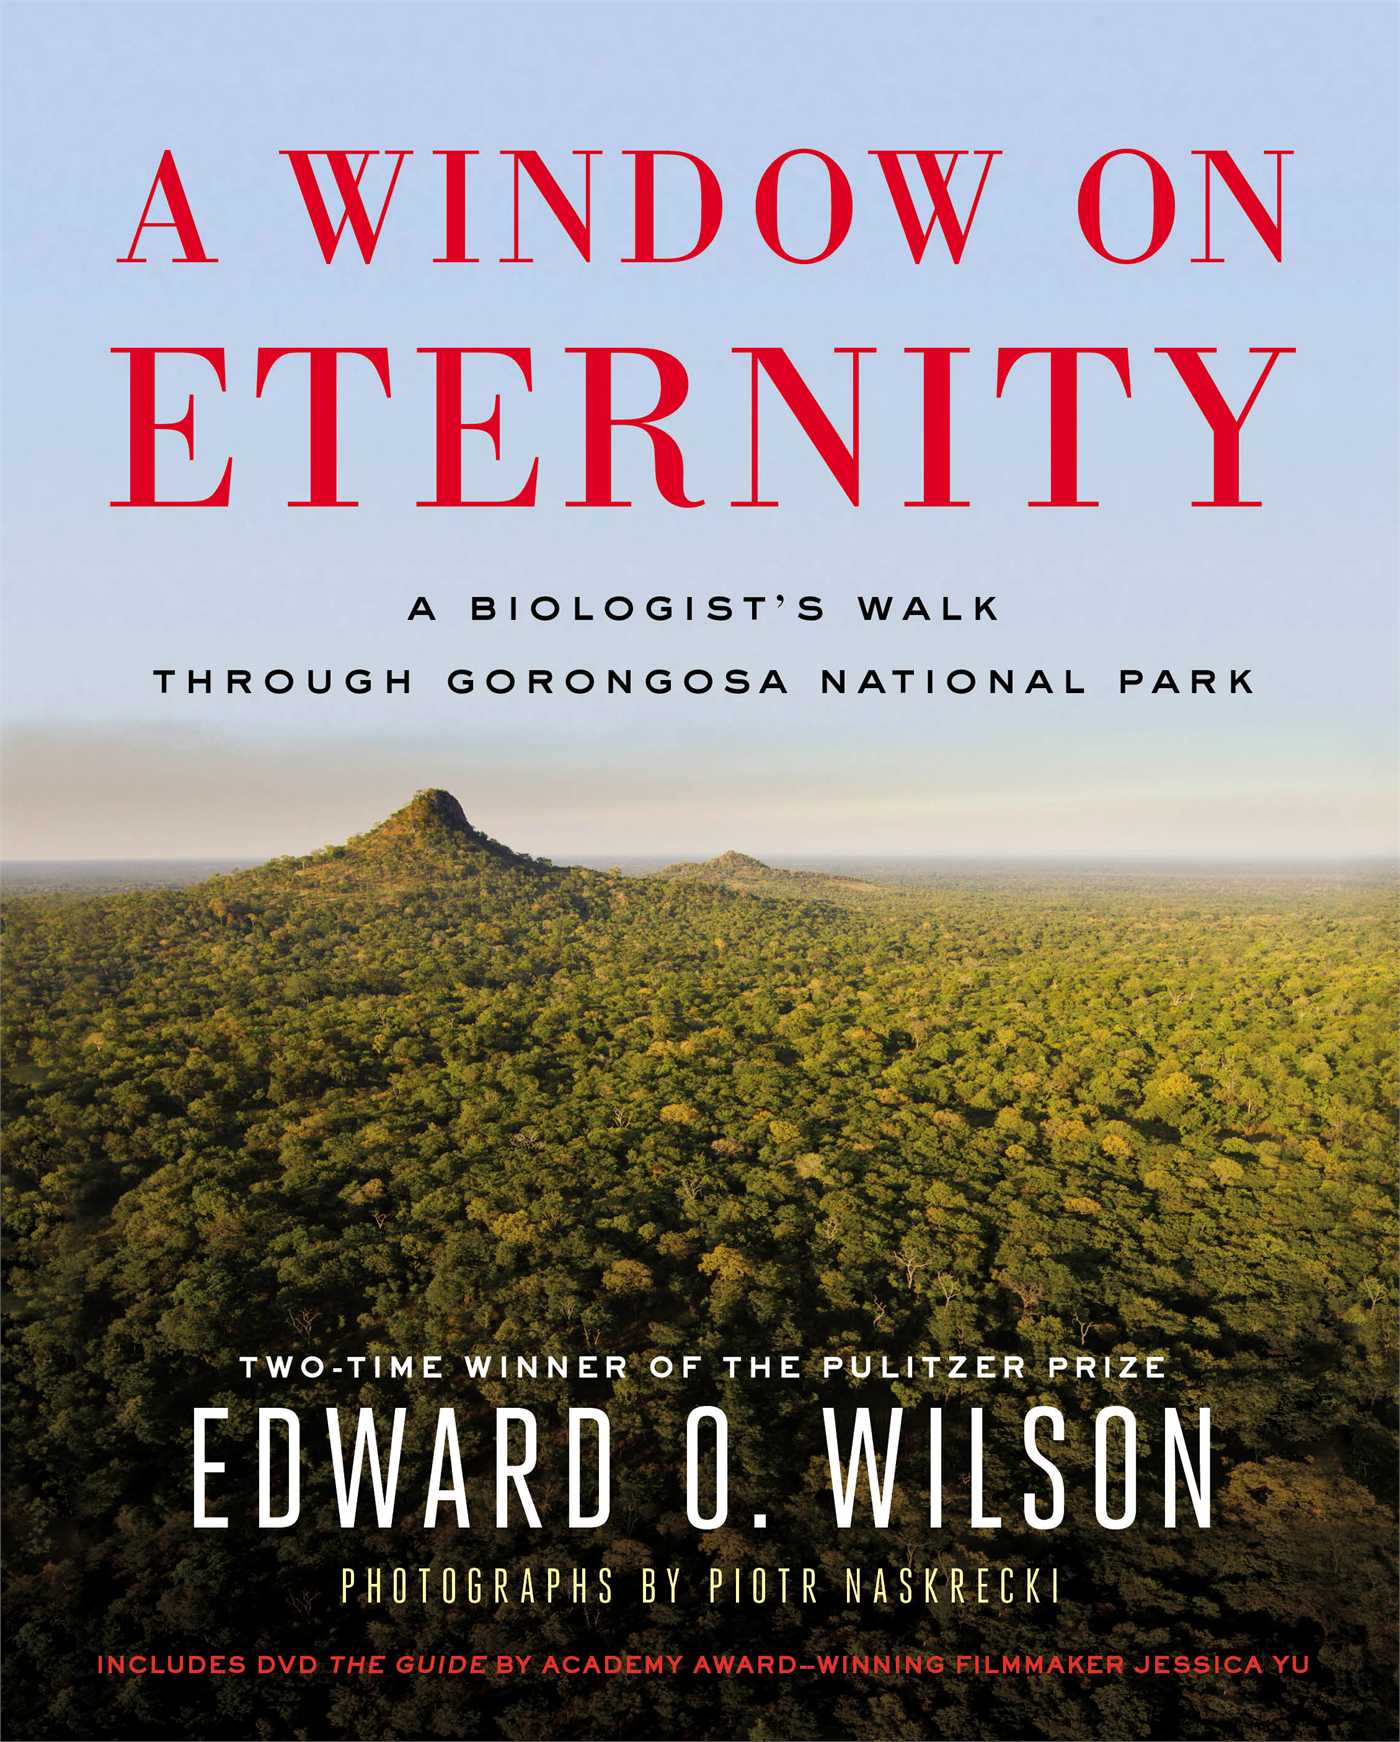 Window on eternity 9781476747415 hr